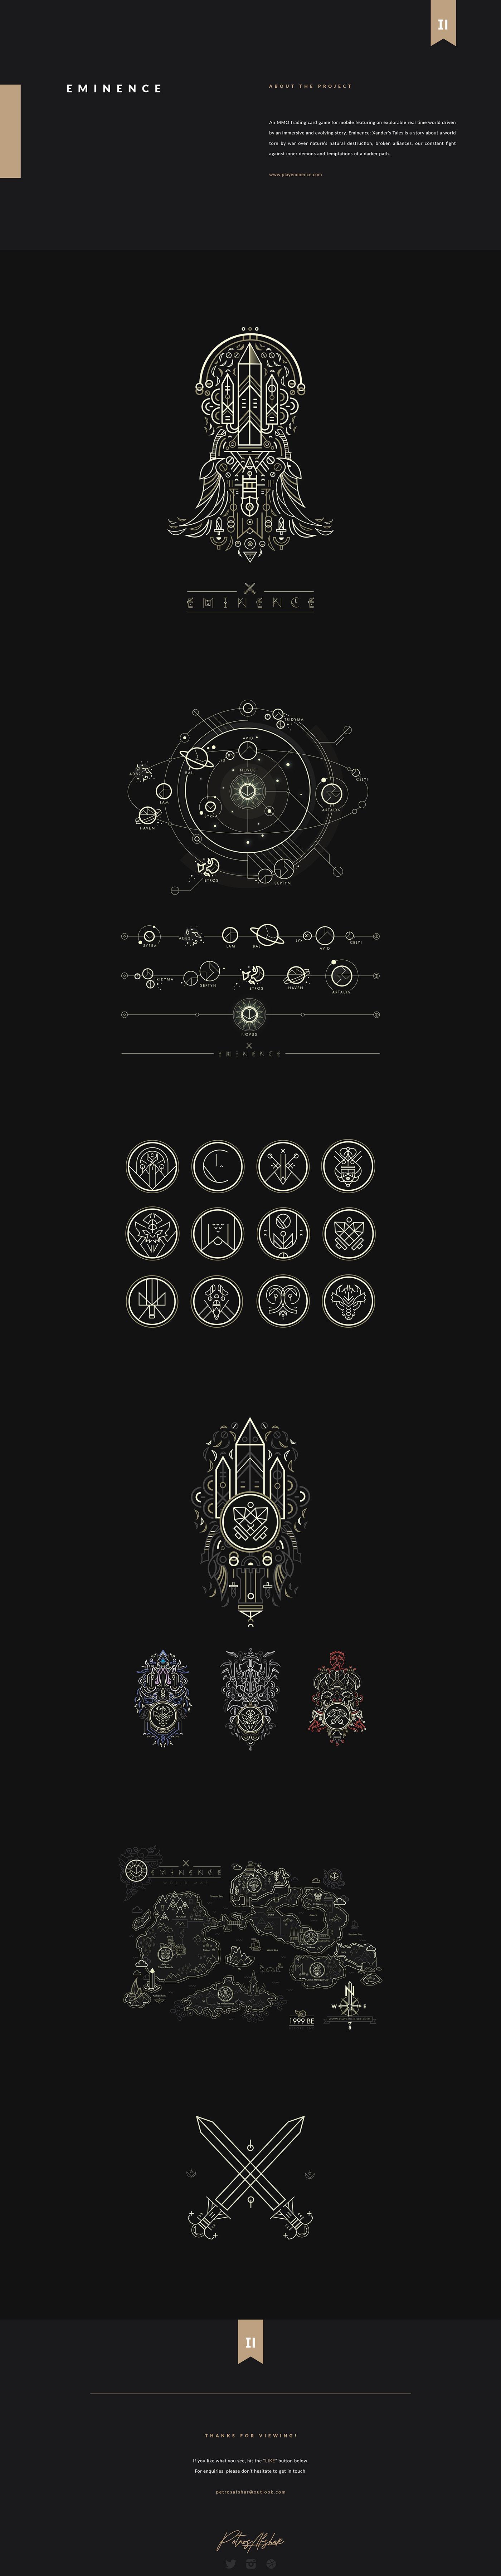 Eminence: Xanders Tales